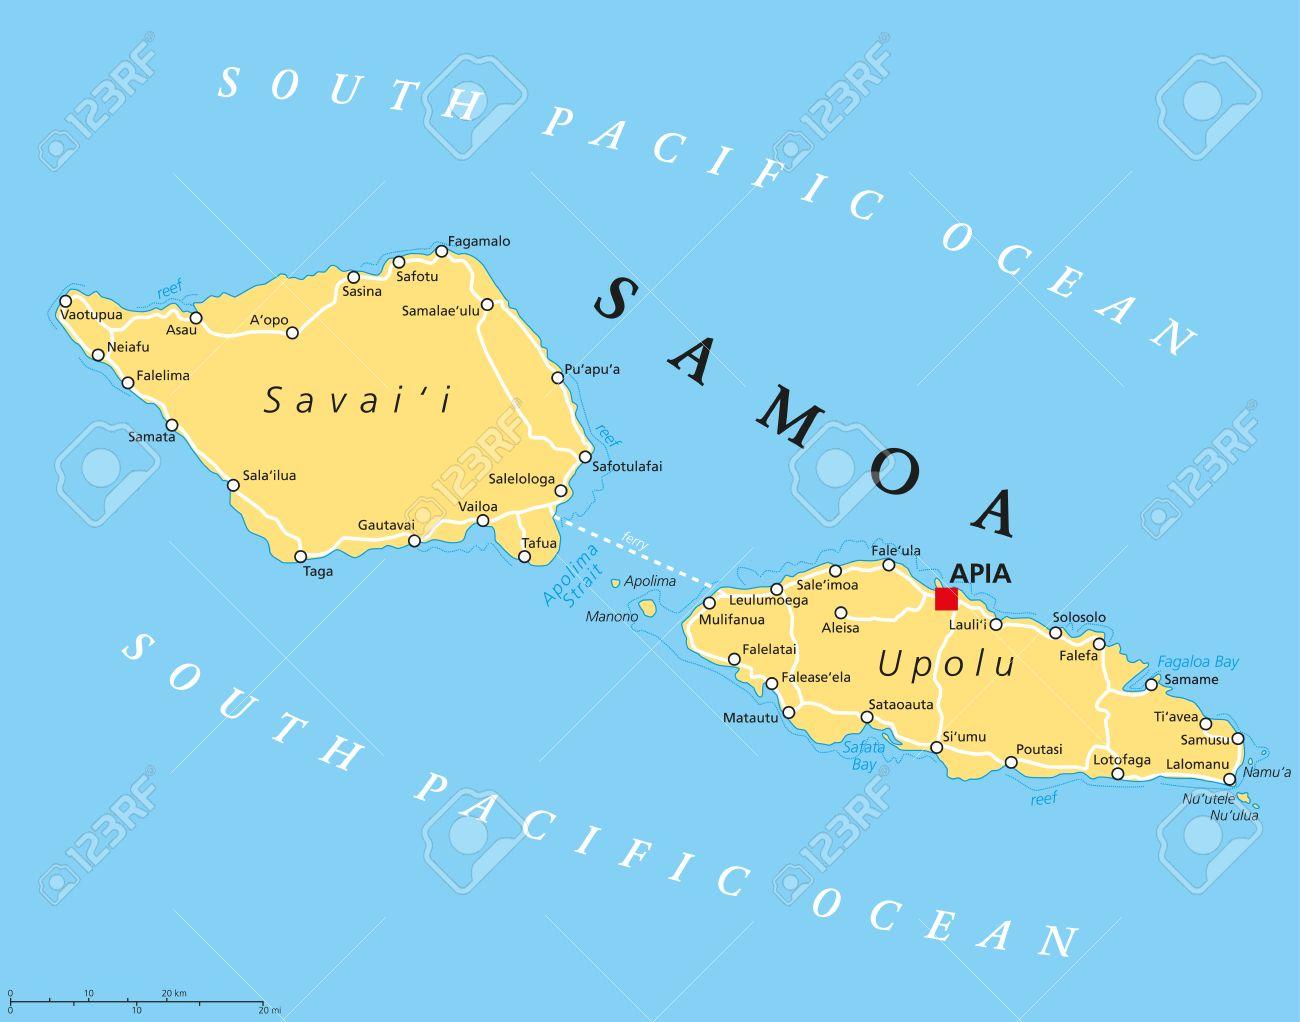 Samoa Political Map With Capital Apia And Important Places - Map samoa